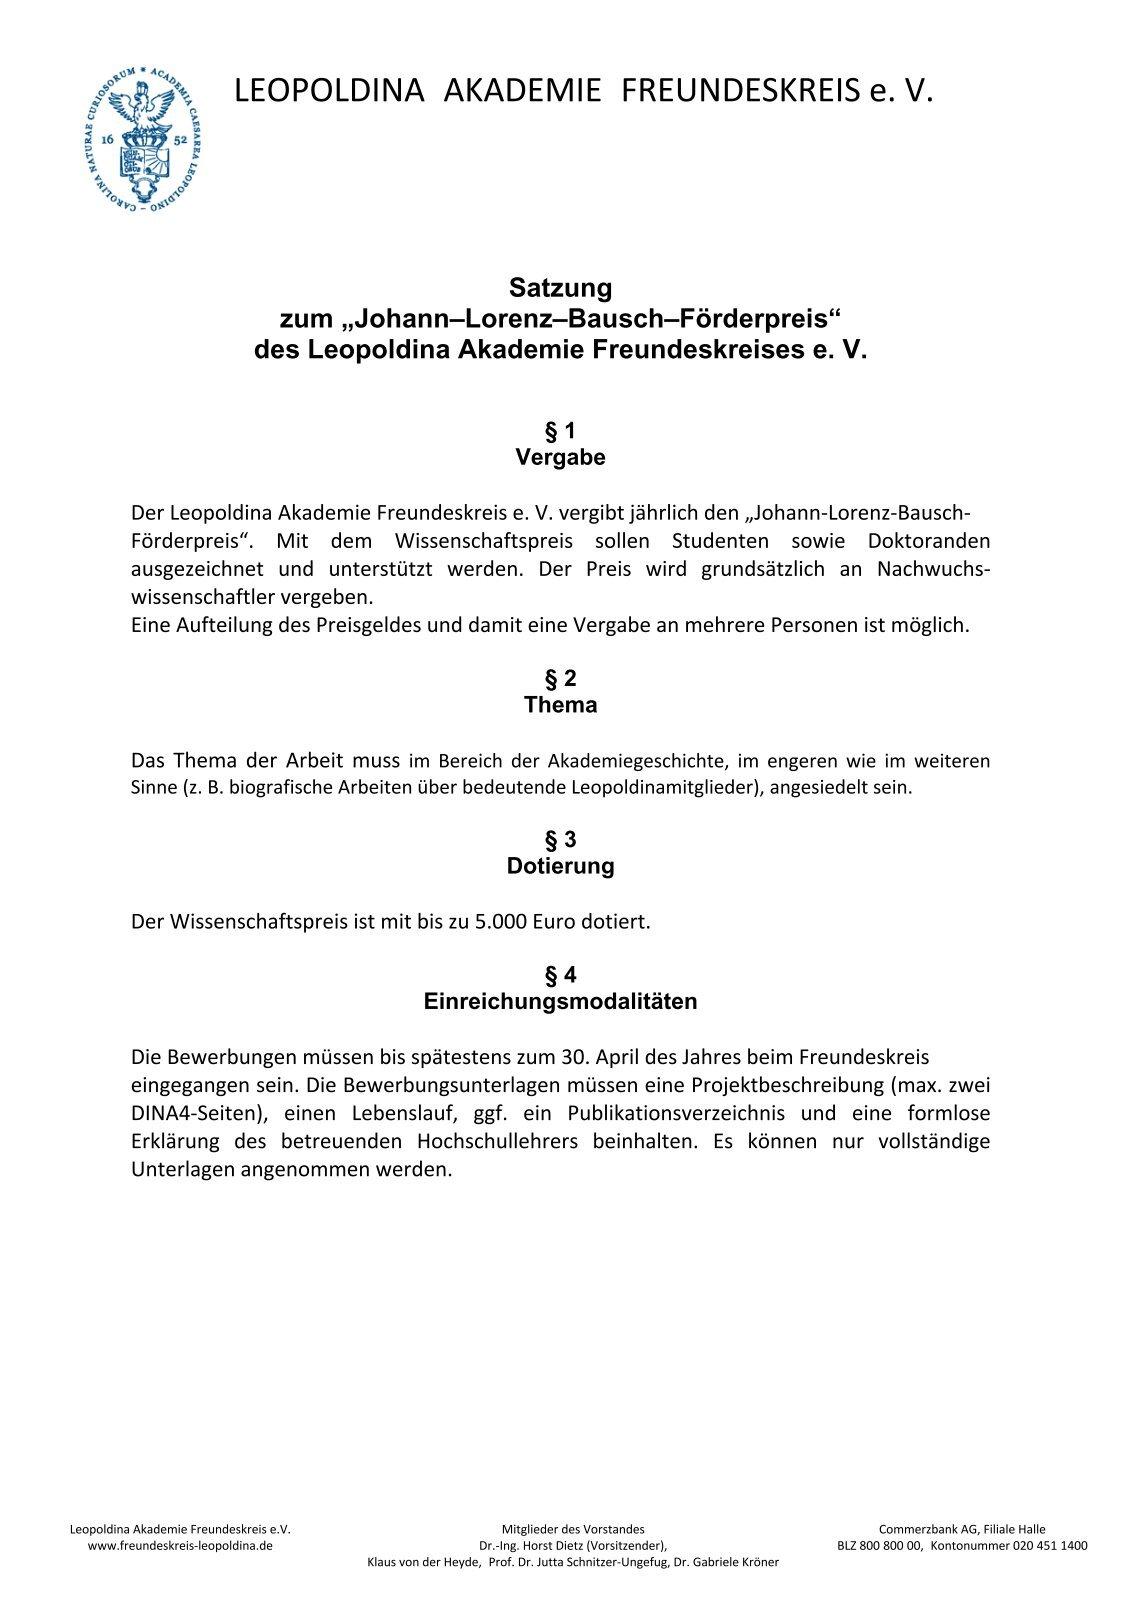 Berühmt Geburtstag Kerze Malseite Bilder - Entry Level Resume ...